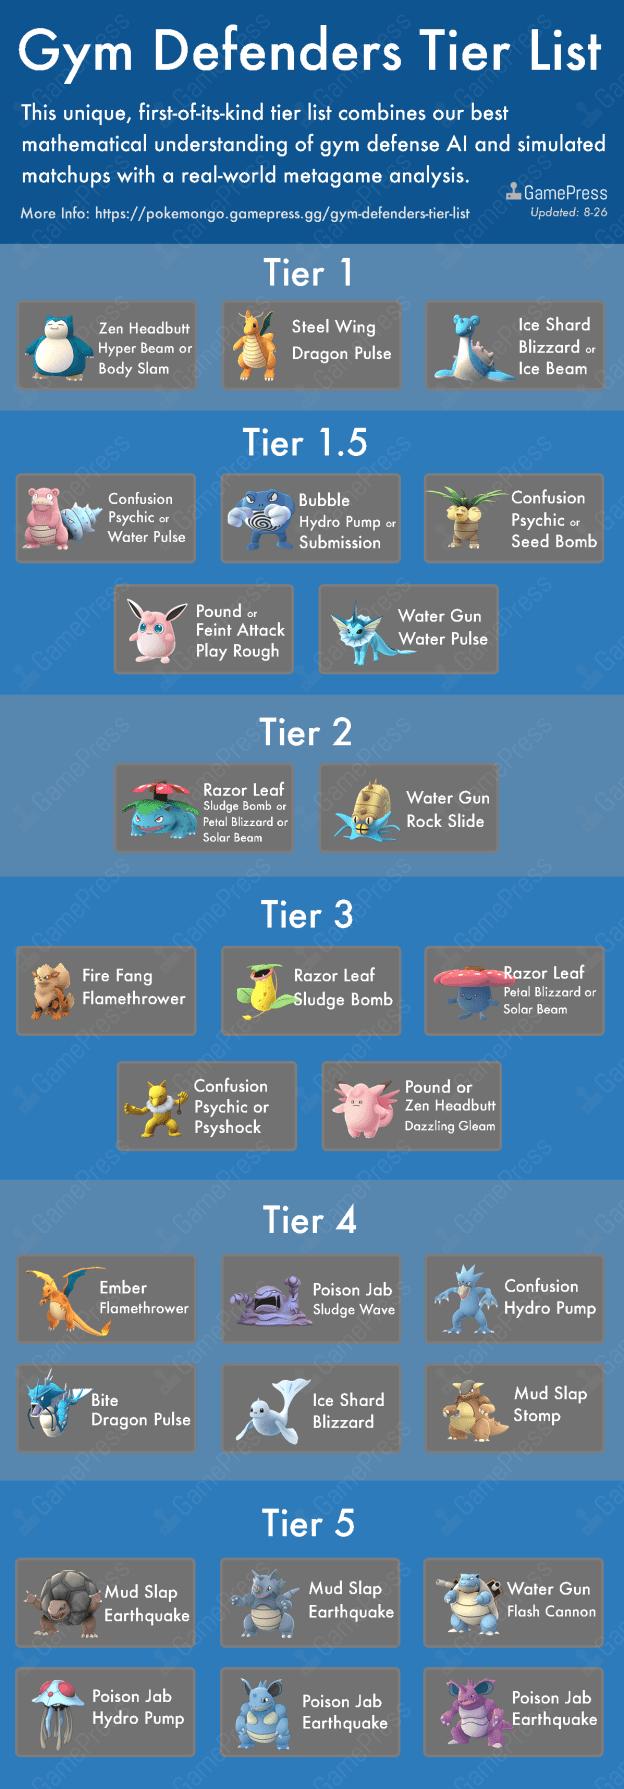 The ultimate Pokemon Go gym defenders tier list